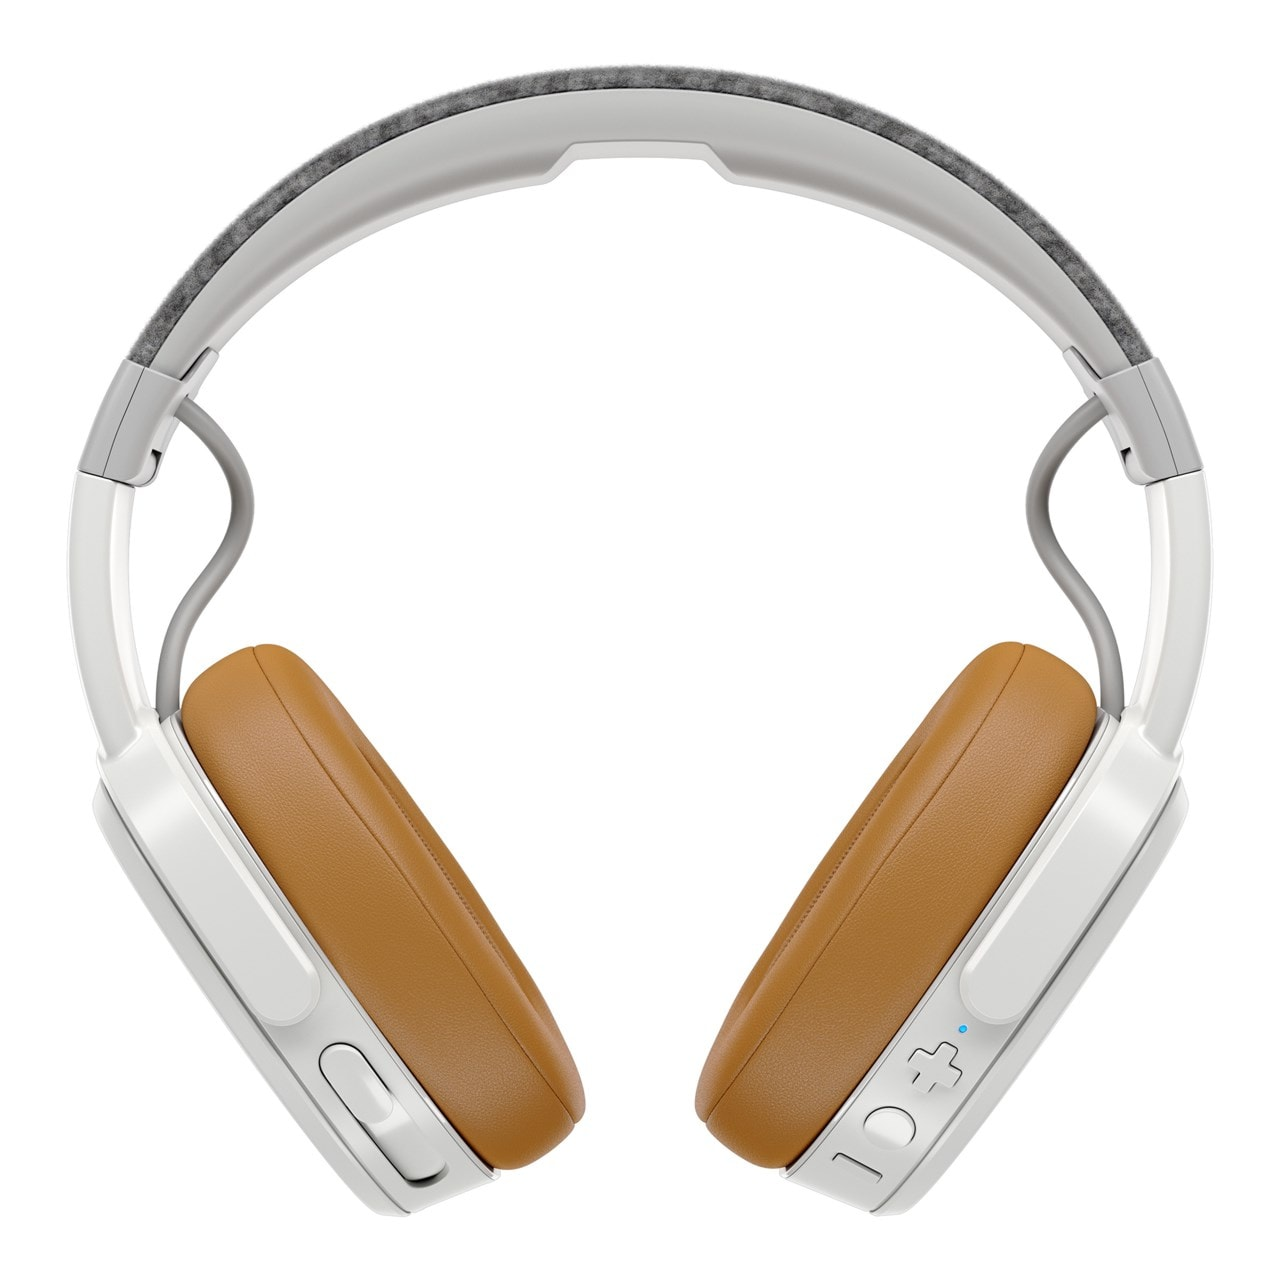 Skullcandy Crusher Grey/Tan Bluetooth Headphones - 1